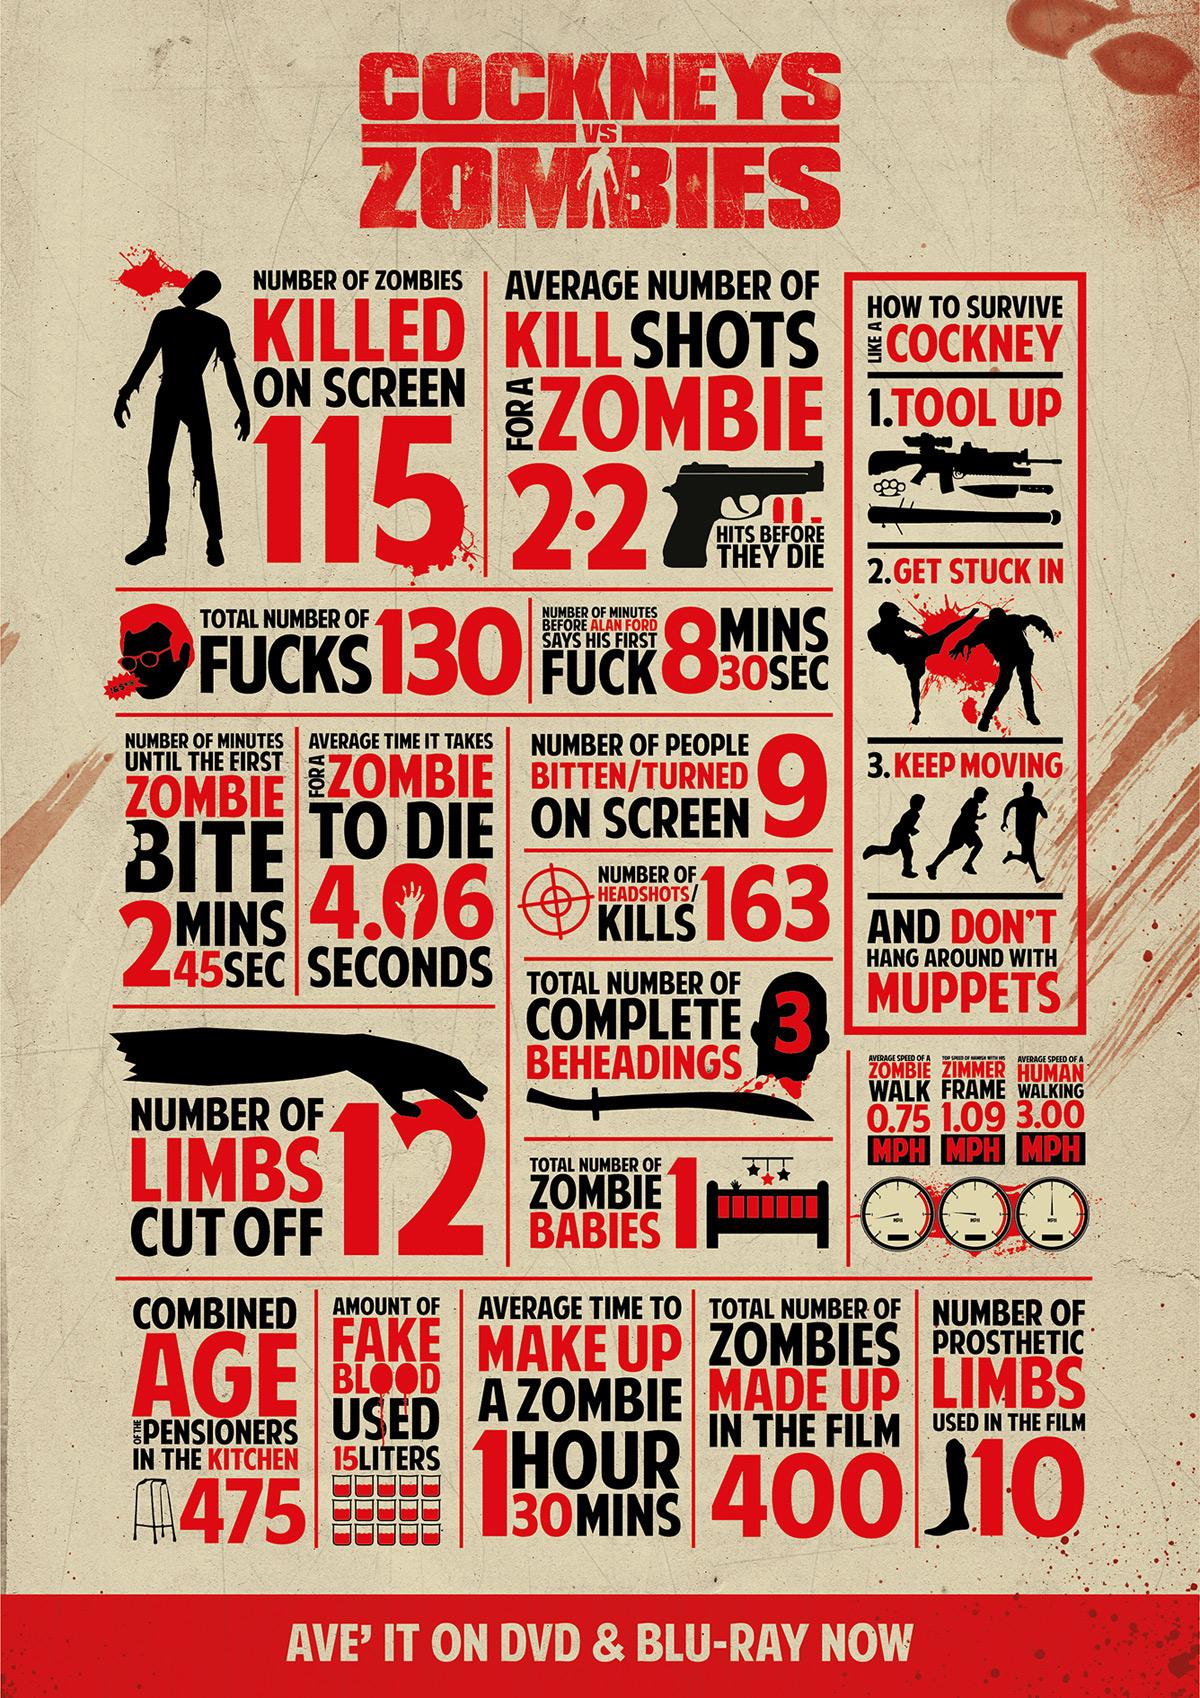 cockney-vs-zombies-infographic